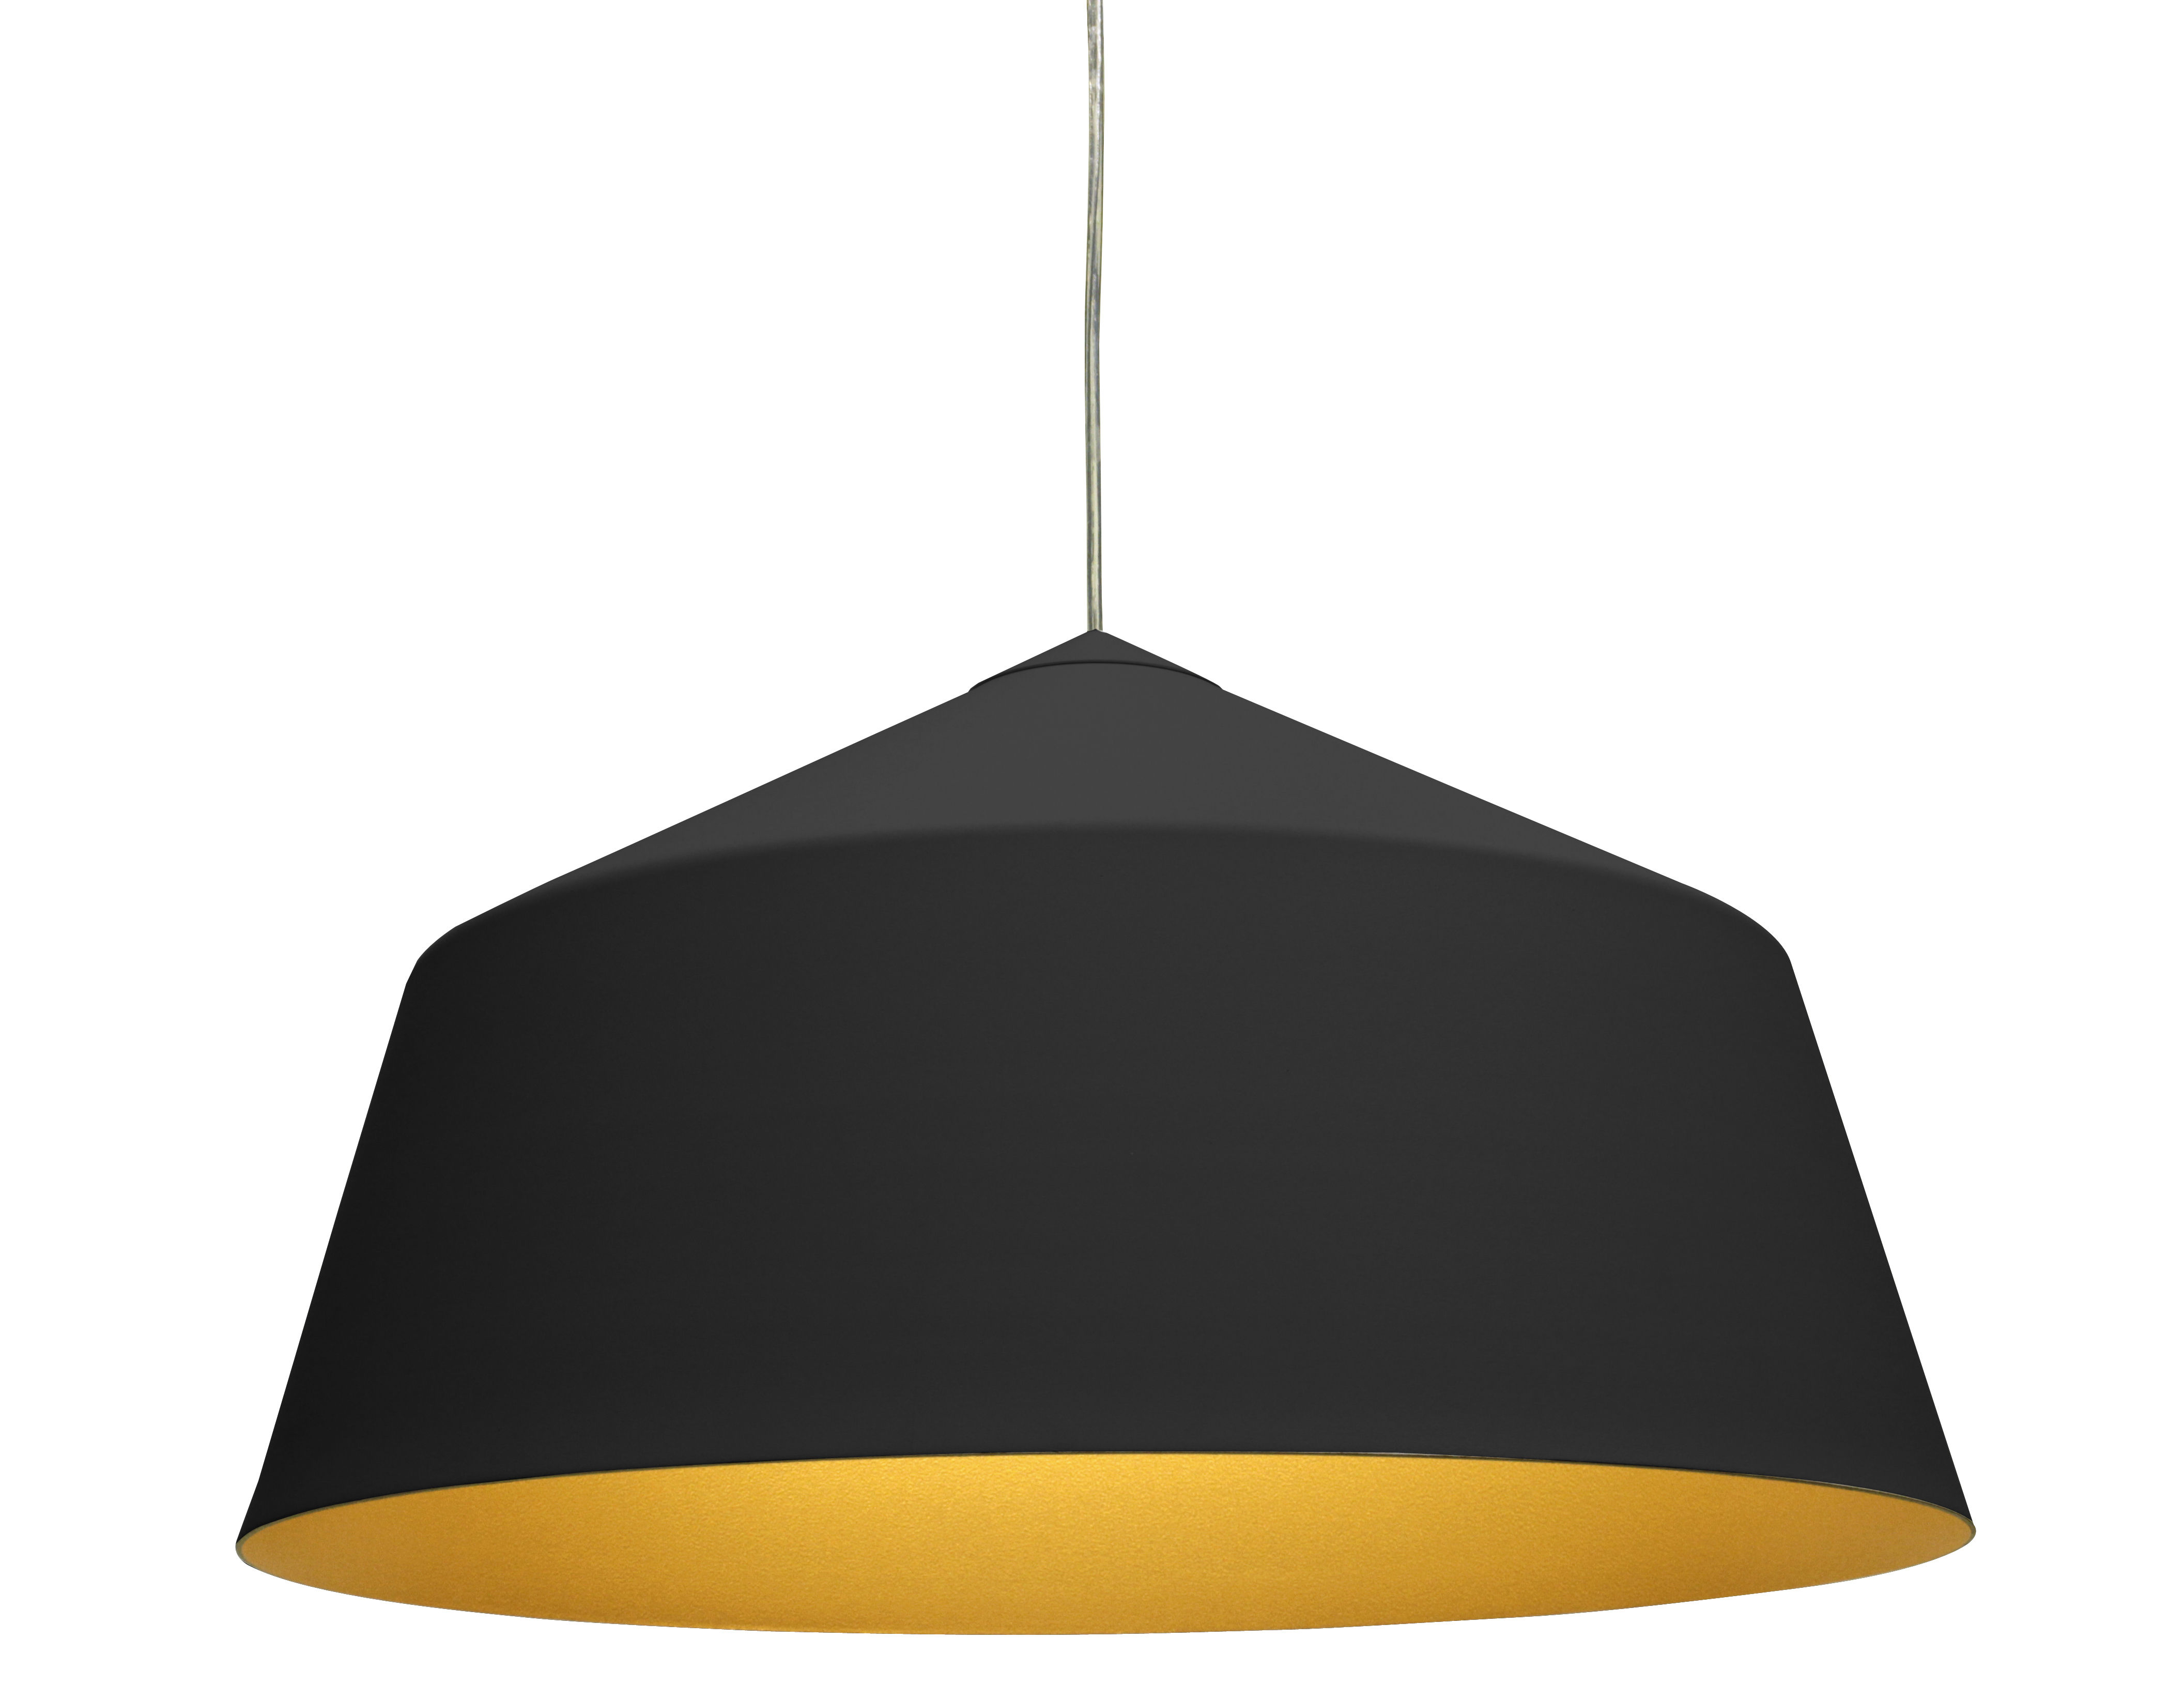 Lighting - Pendant Lighting - Circus Large Pendant - Ø 56 x H 31 cm by Innermost - Ø 56 cm - Matt black / Antique gold metallic inside - Aluminium